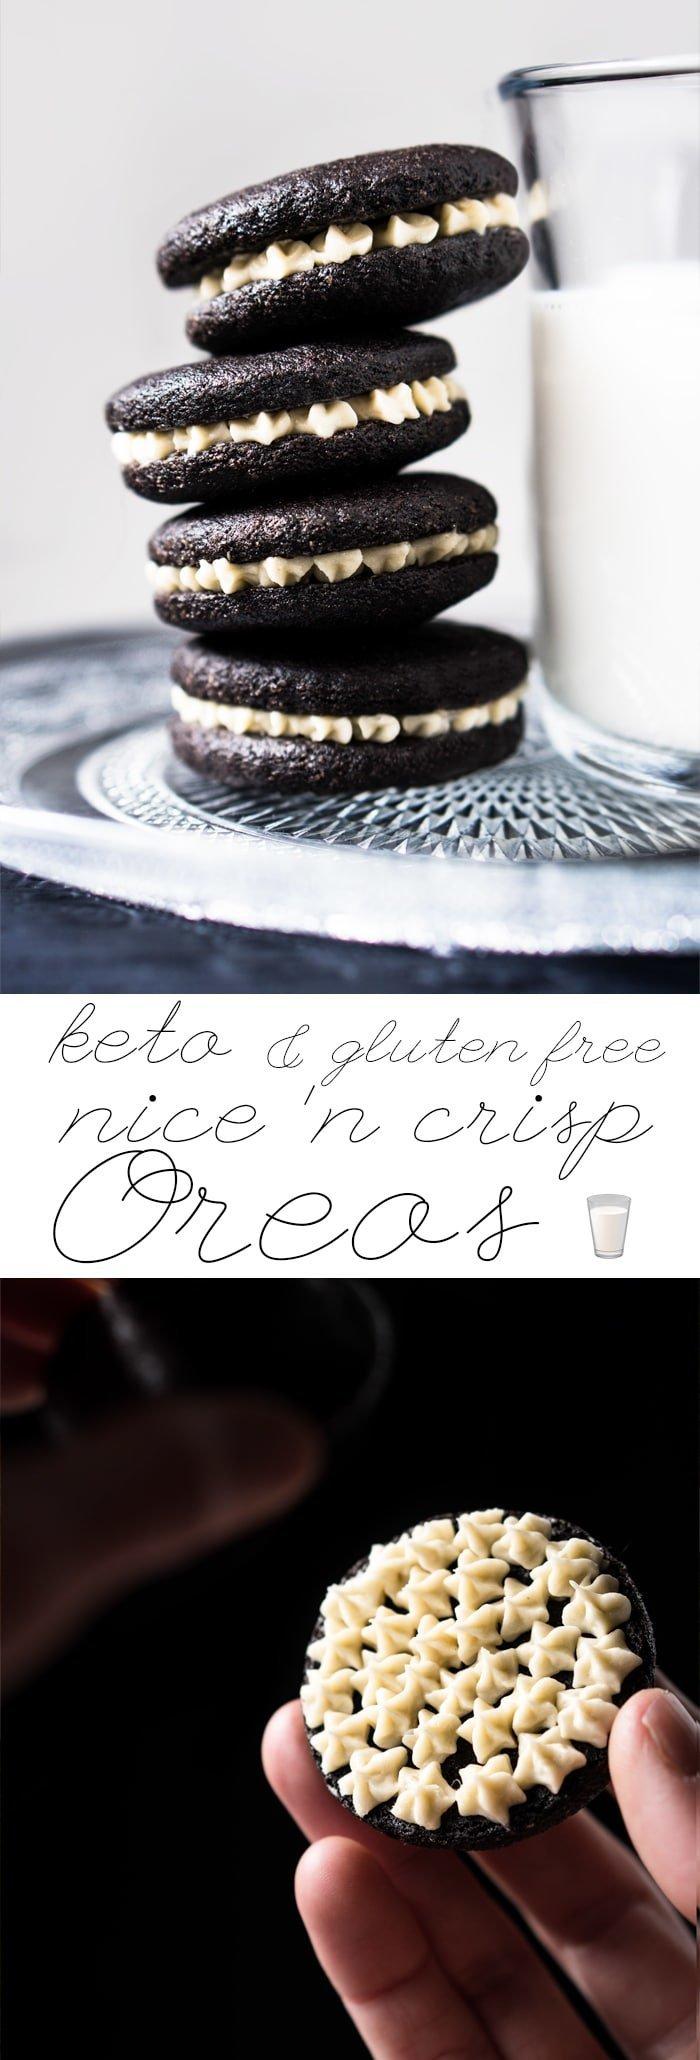 Grain Free, Gluten Free & Keto Oreo Cookies 🥛 Properly crisp! #keto #ketodessert #ketocookies #grainfree